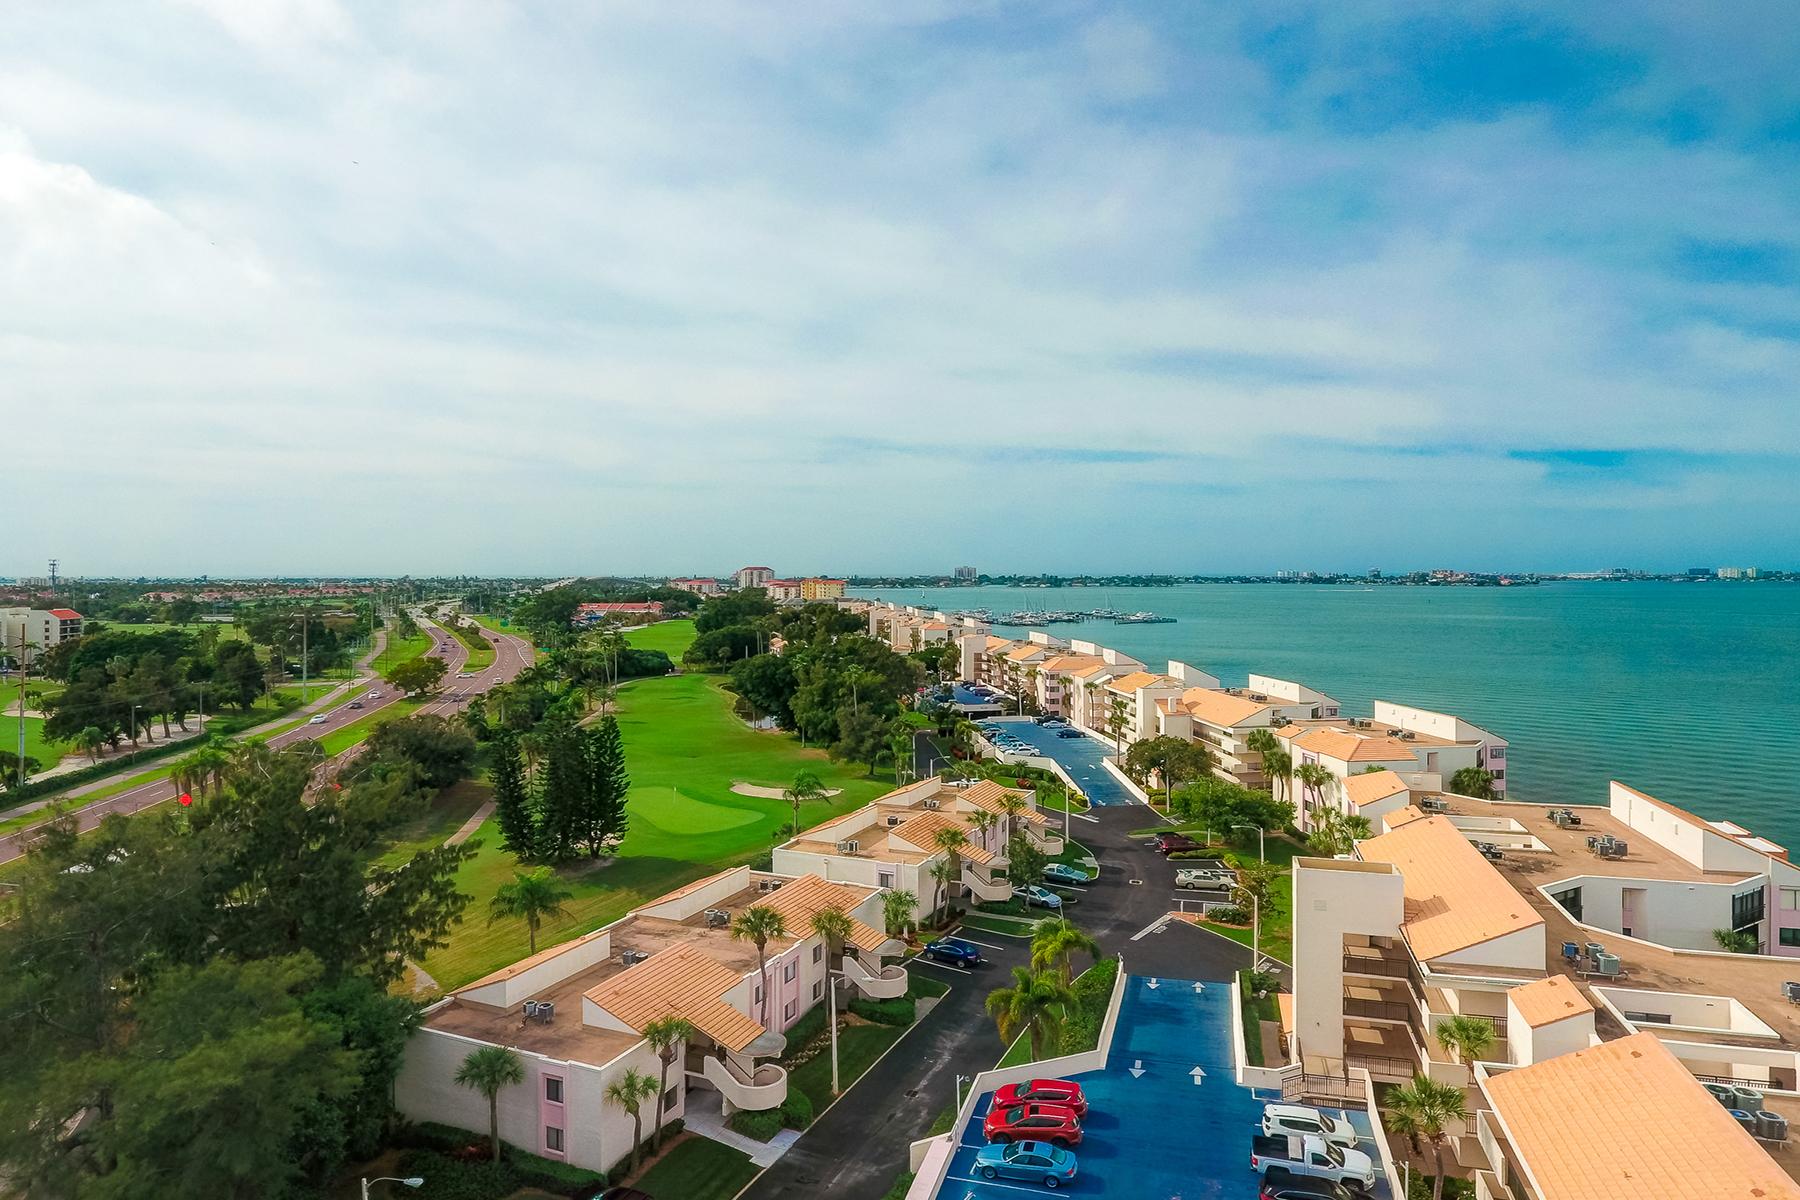 condominiums for Active at ST. PETERSBURG 5510 La Puerta Del Sol Blvd S , 134 St. Petersburg, Florida 33715 United States